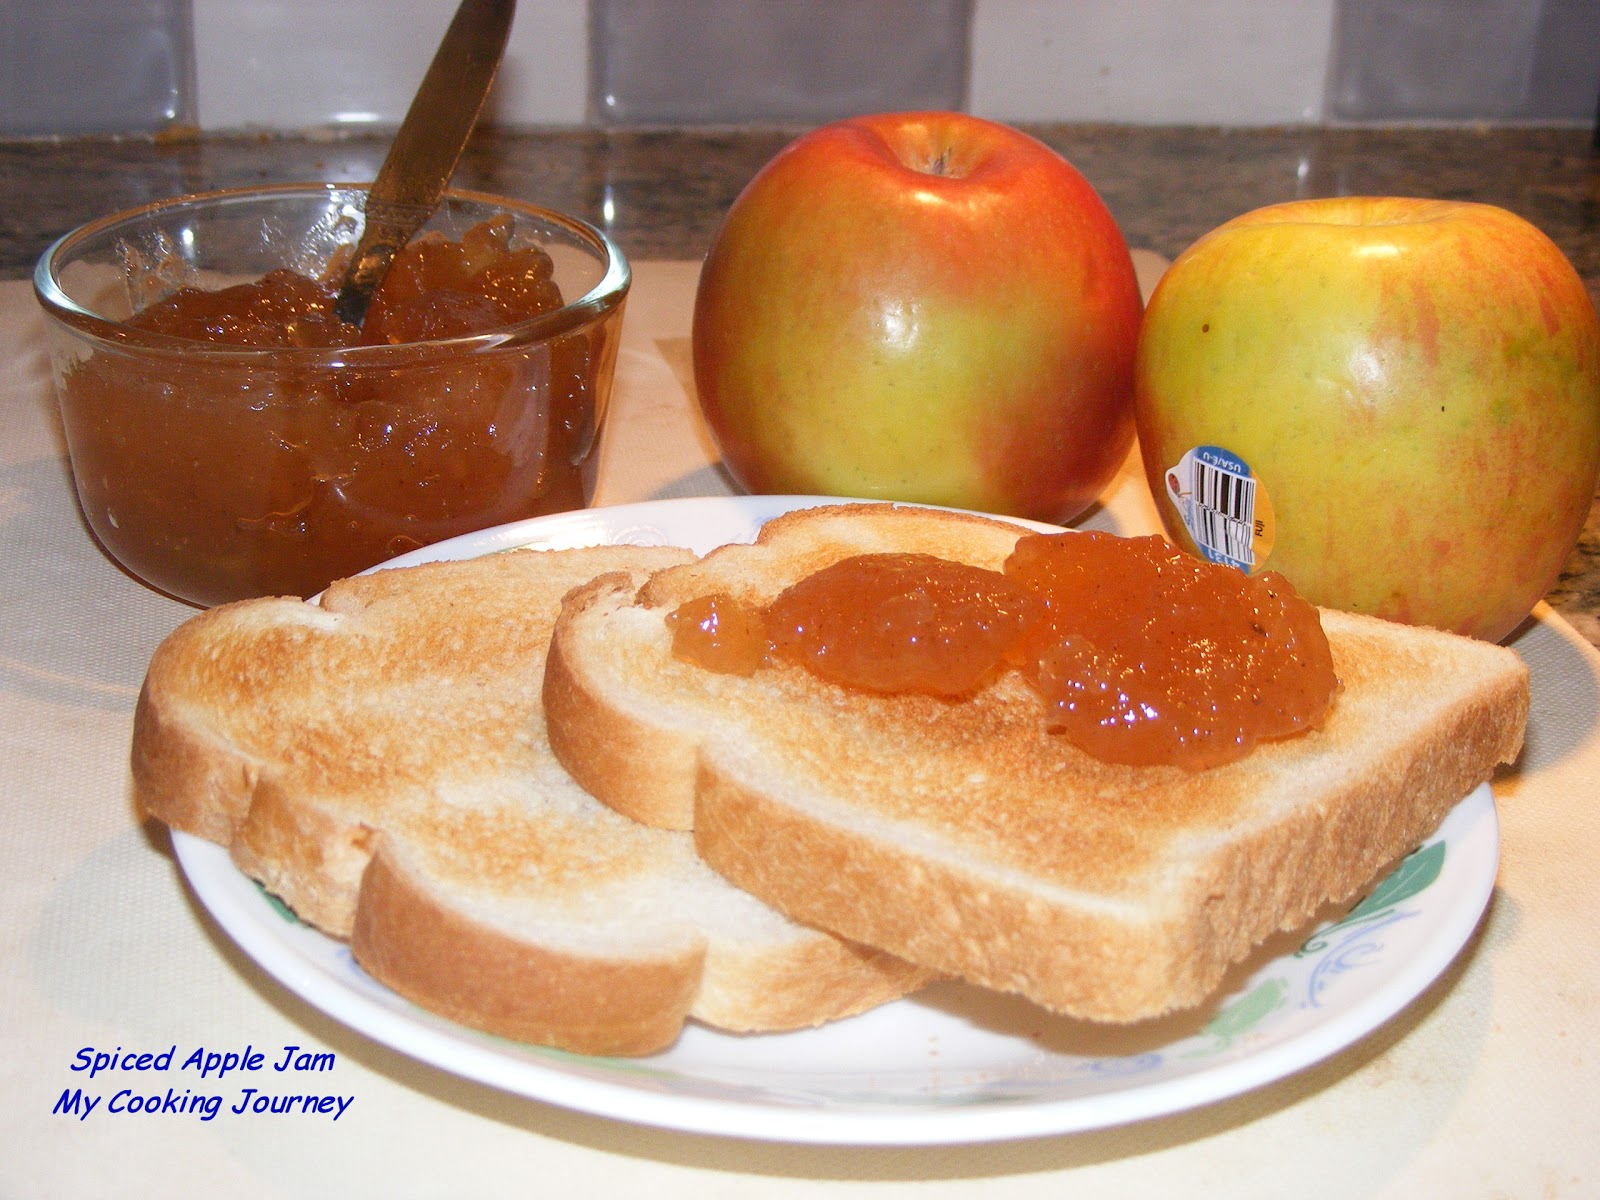 Pork loin recipes apple jelly